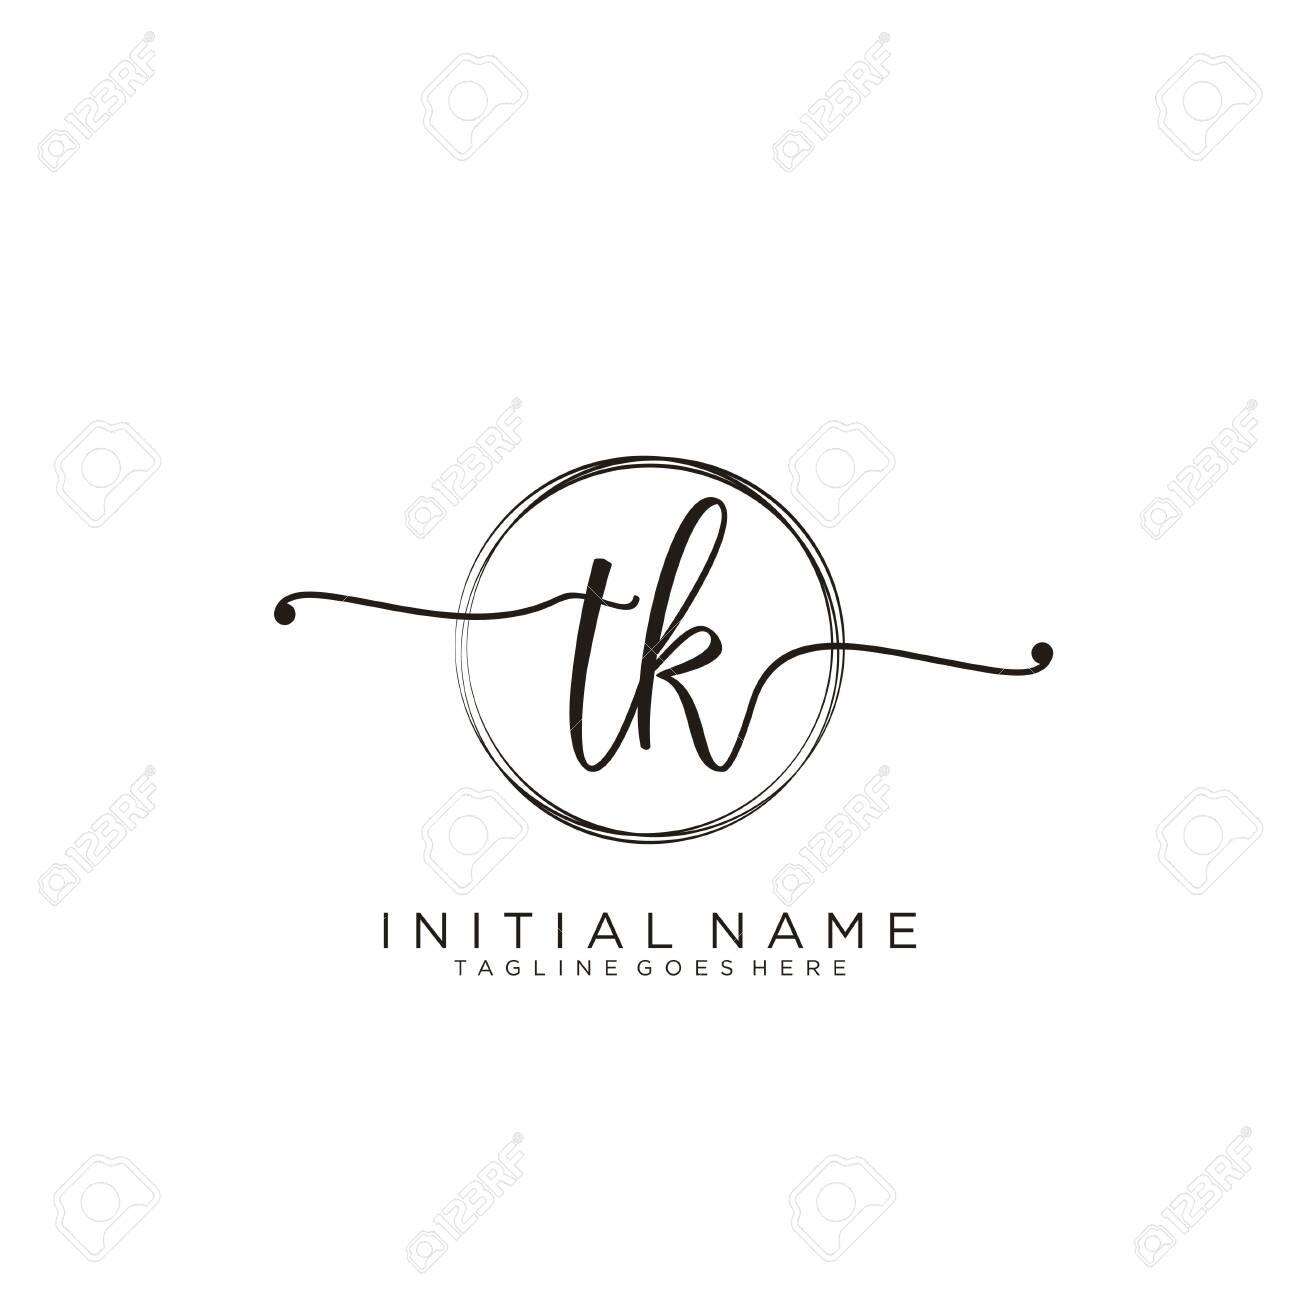 TK Initial handwriting logo with circle template vector. - 144420086